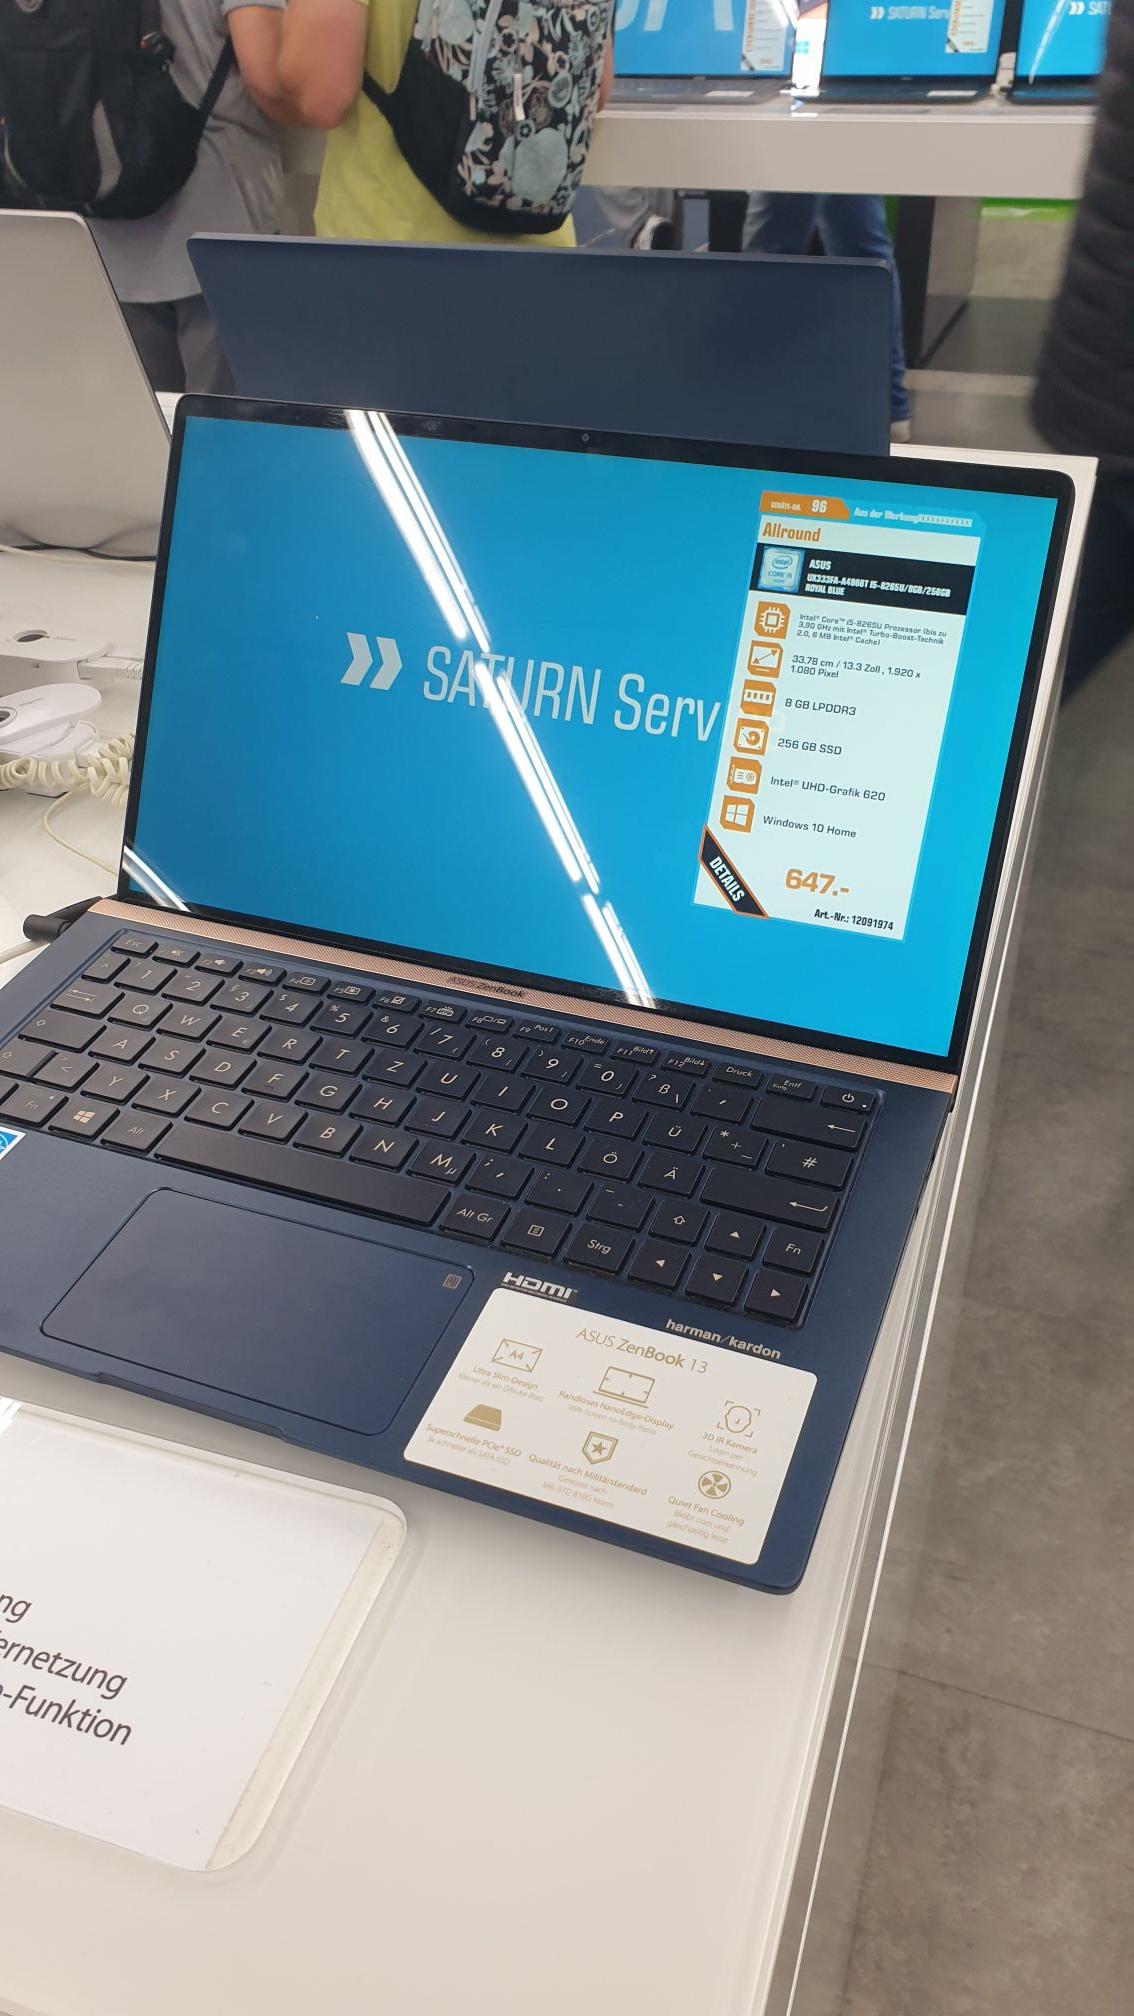 [Lokal Berlin] Saturn Alexanderplatz Asus Zenbook UX333 13 Zoll Intel i5-8265U 8GB Ram